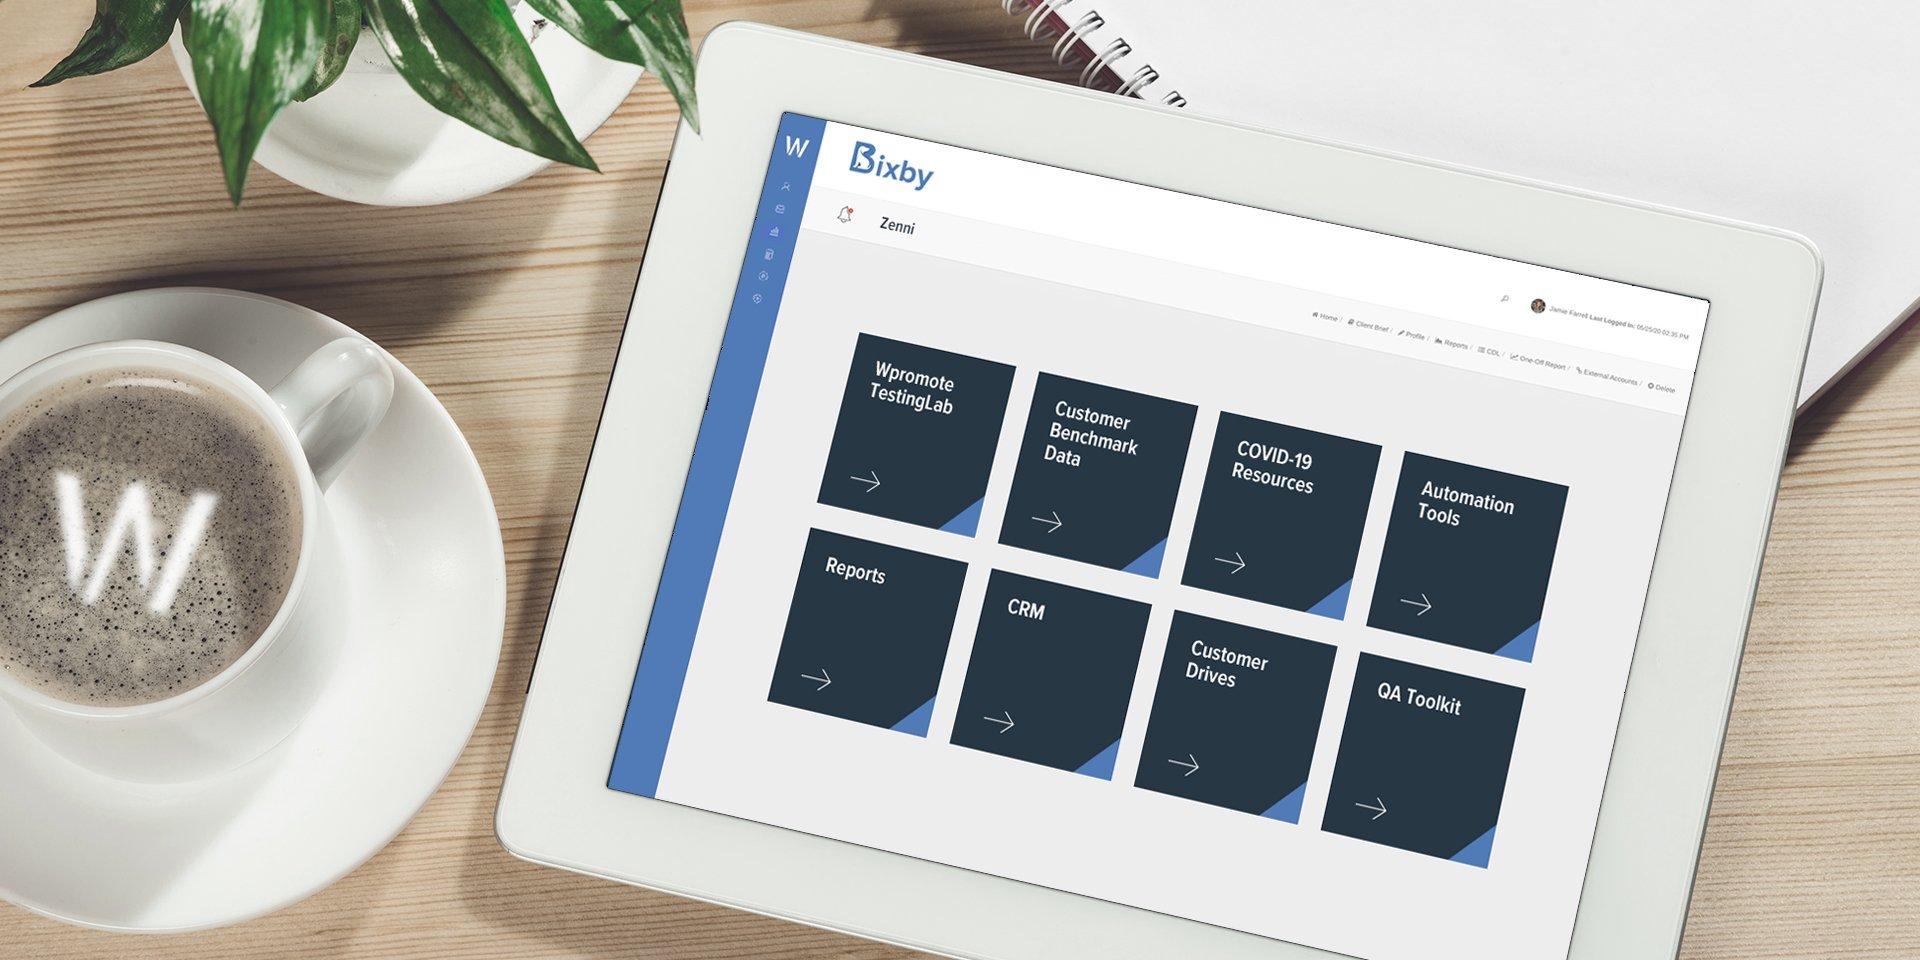 iPad screen with Bixby dashboard